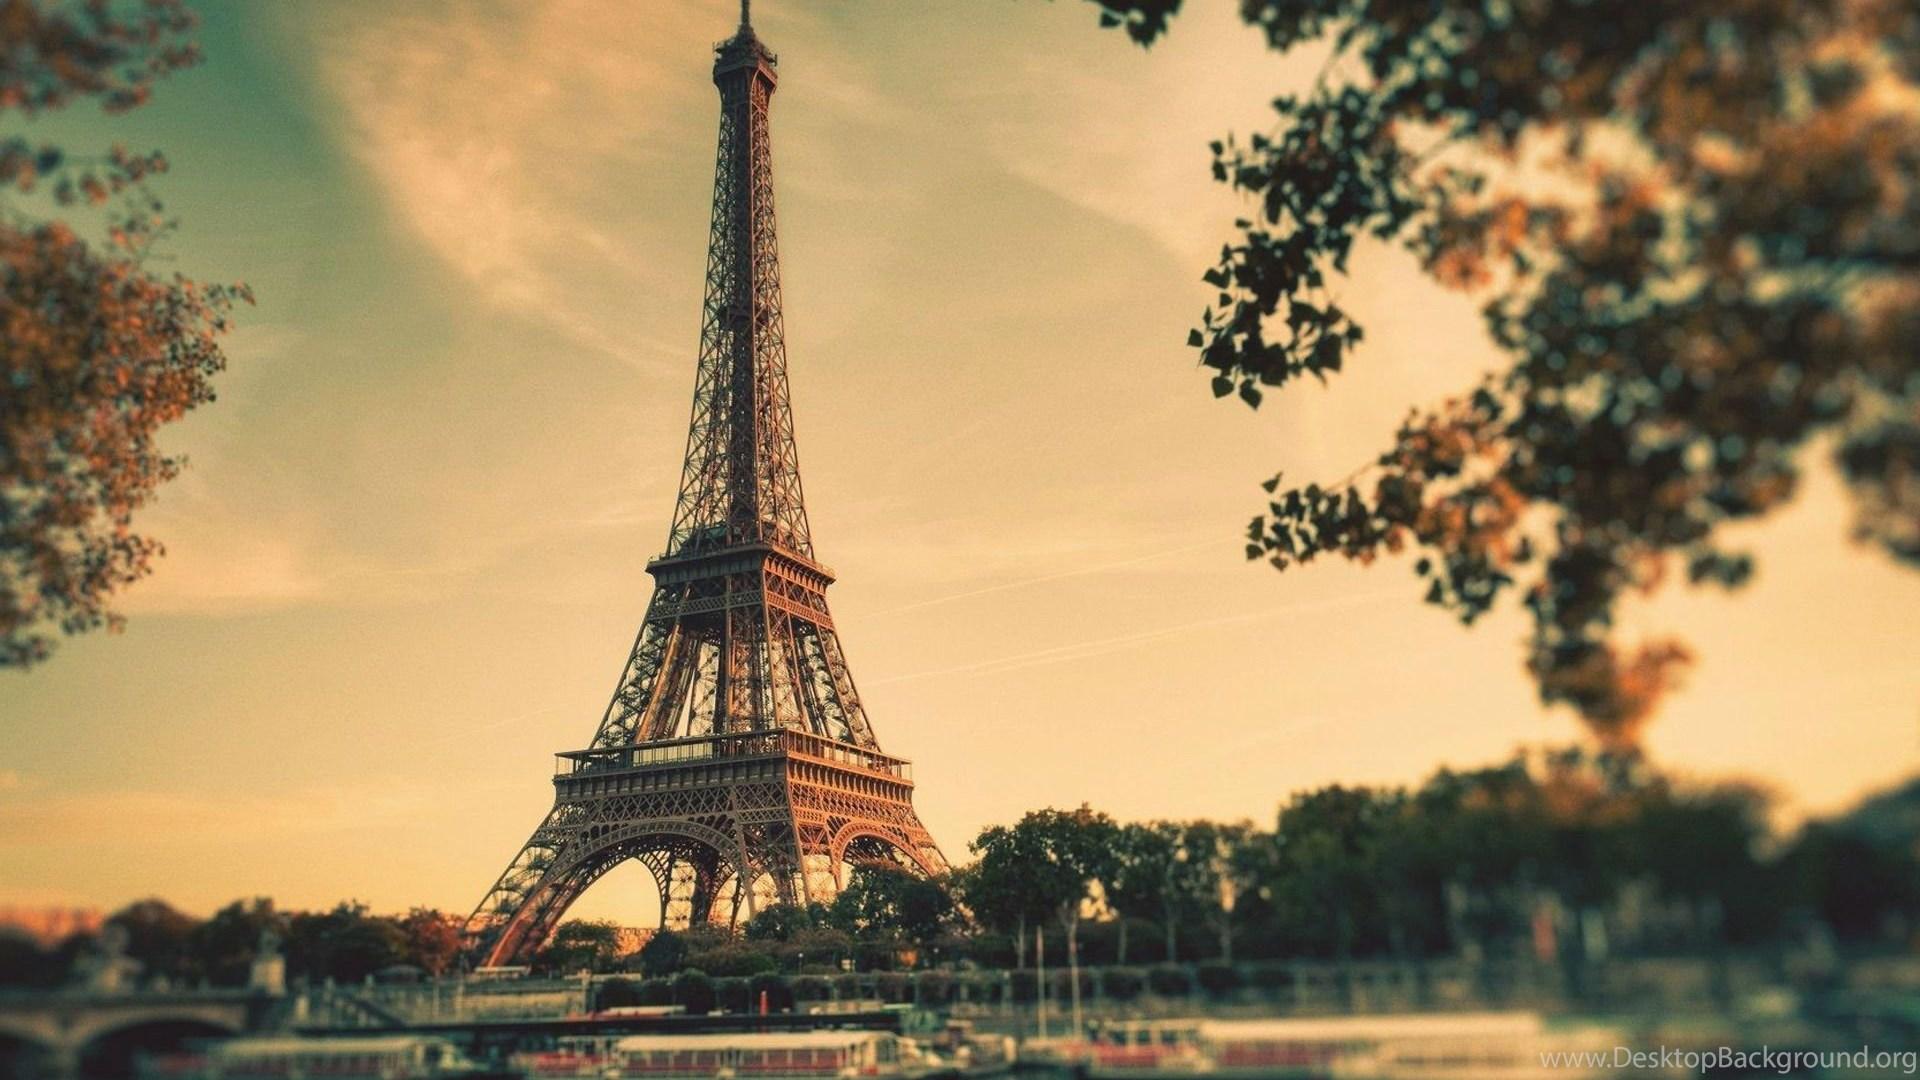 Beautiful Eiffel Tower In Paris Hd Wallpapers Desktop Background